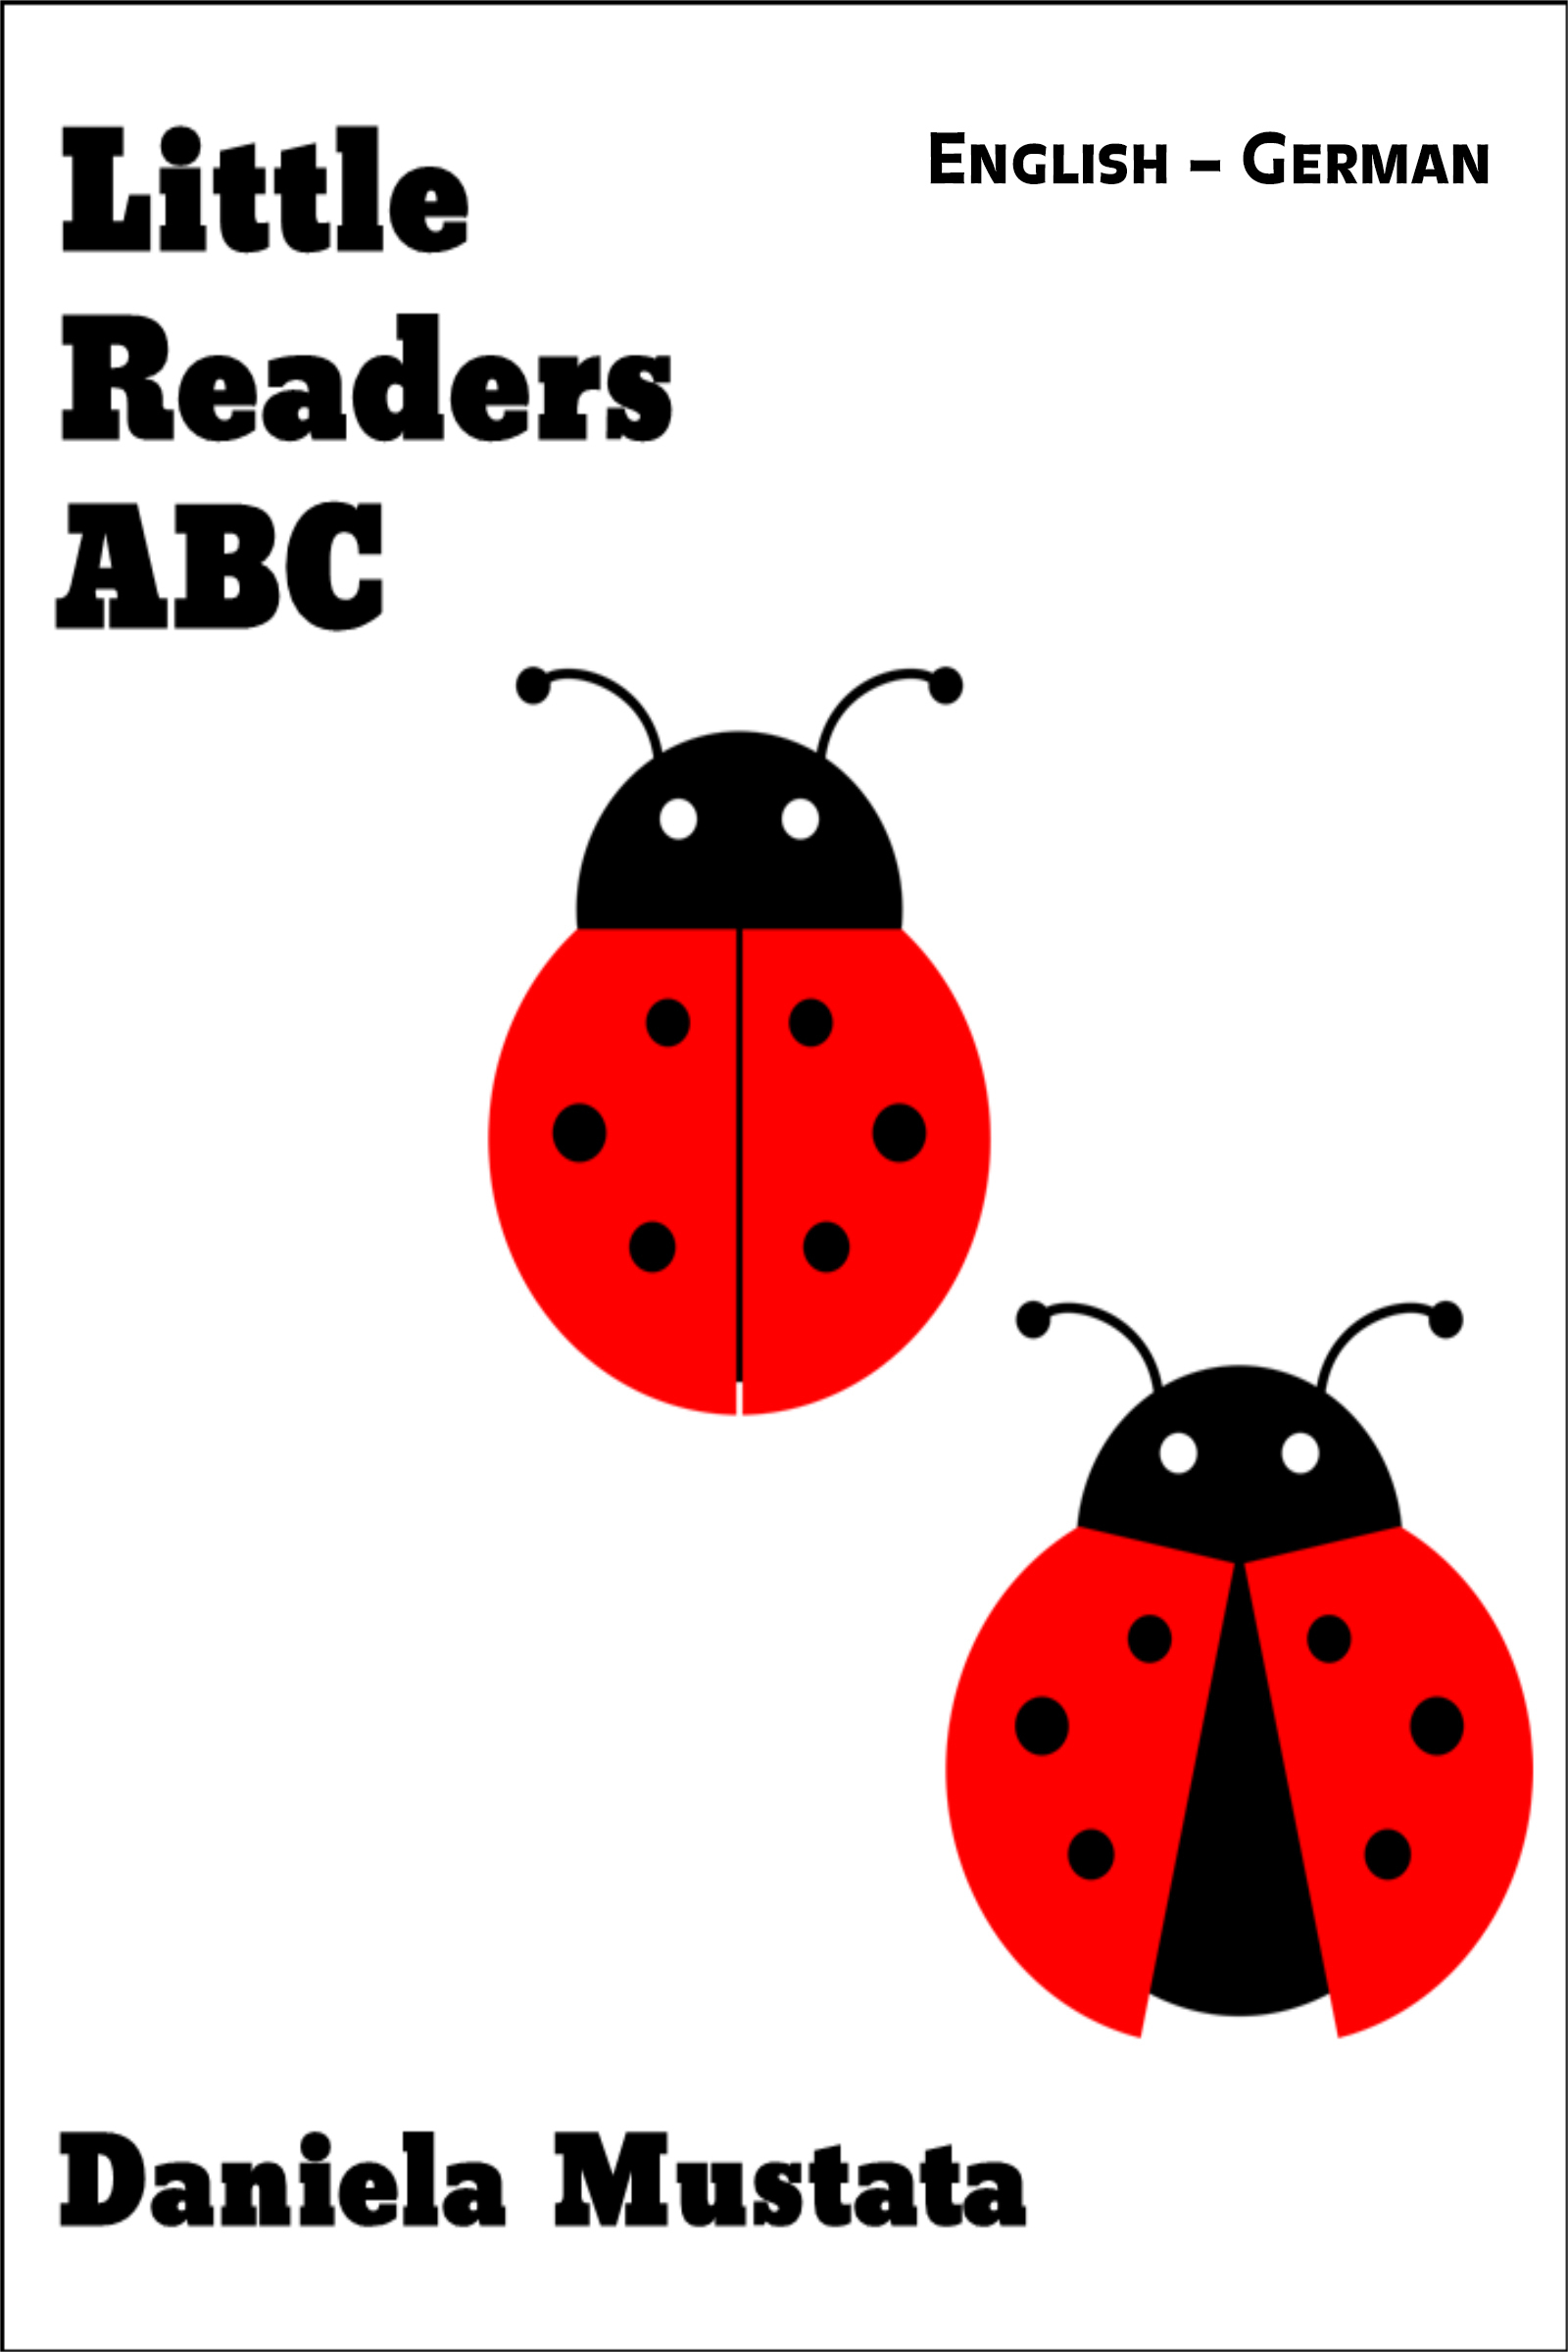 Little Readers ABC: English – German Daniela Mustata